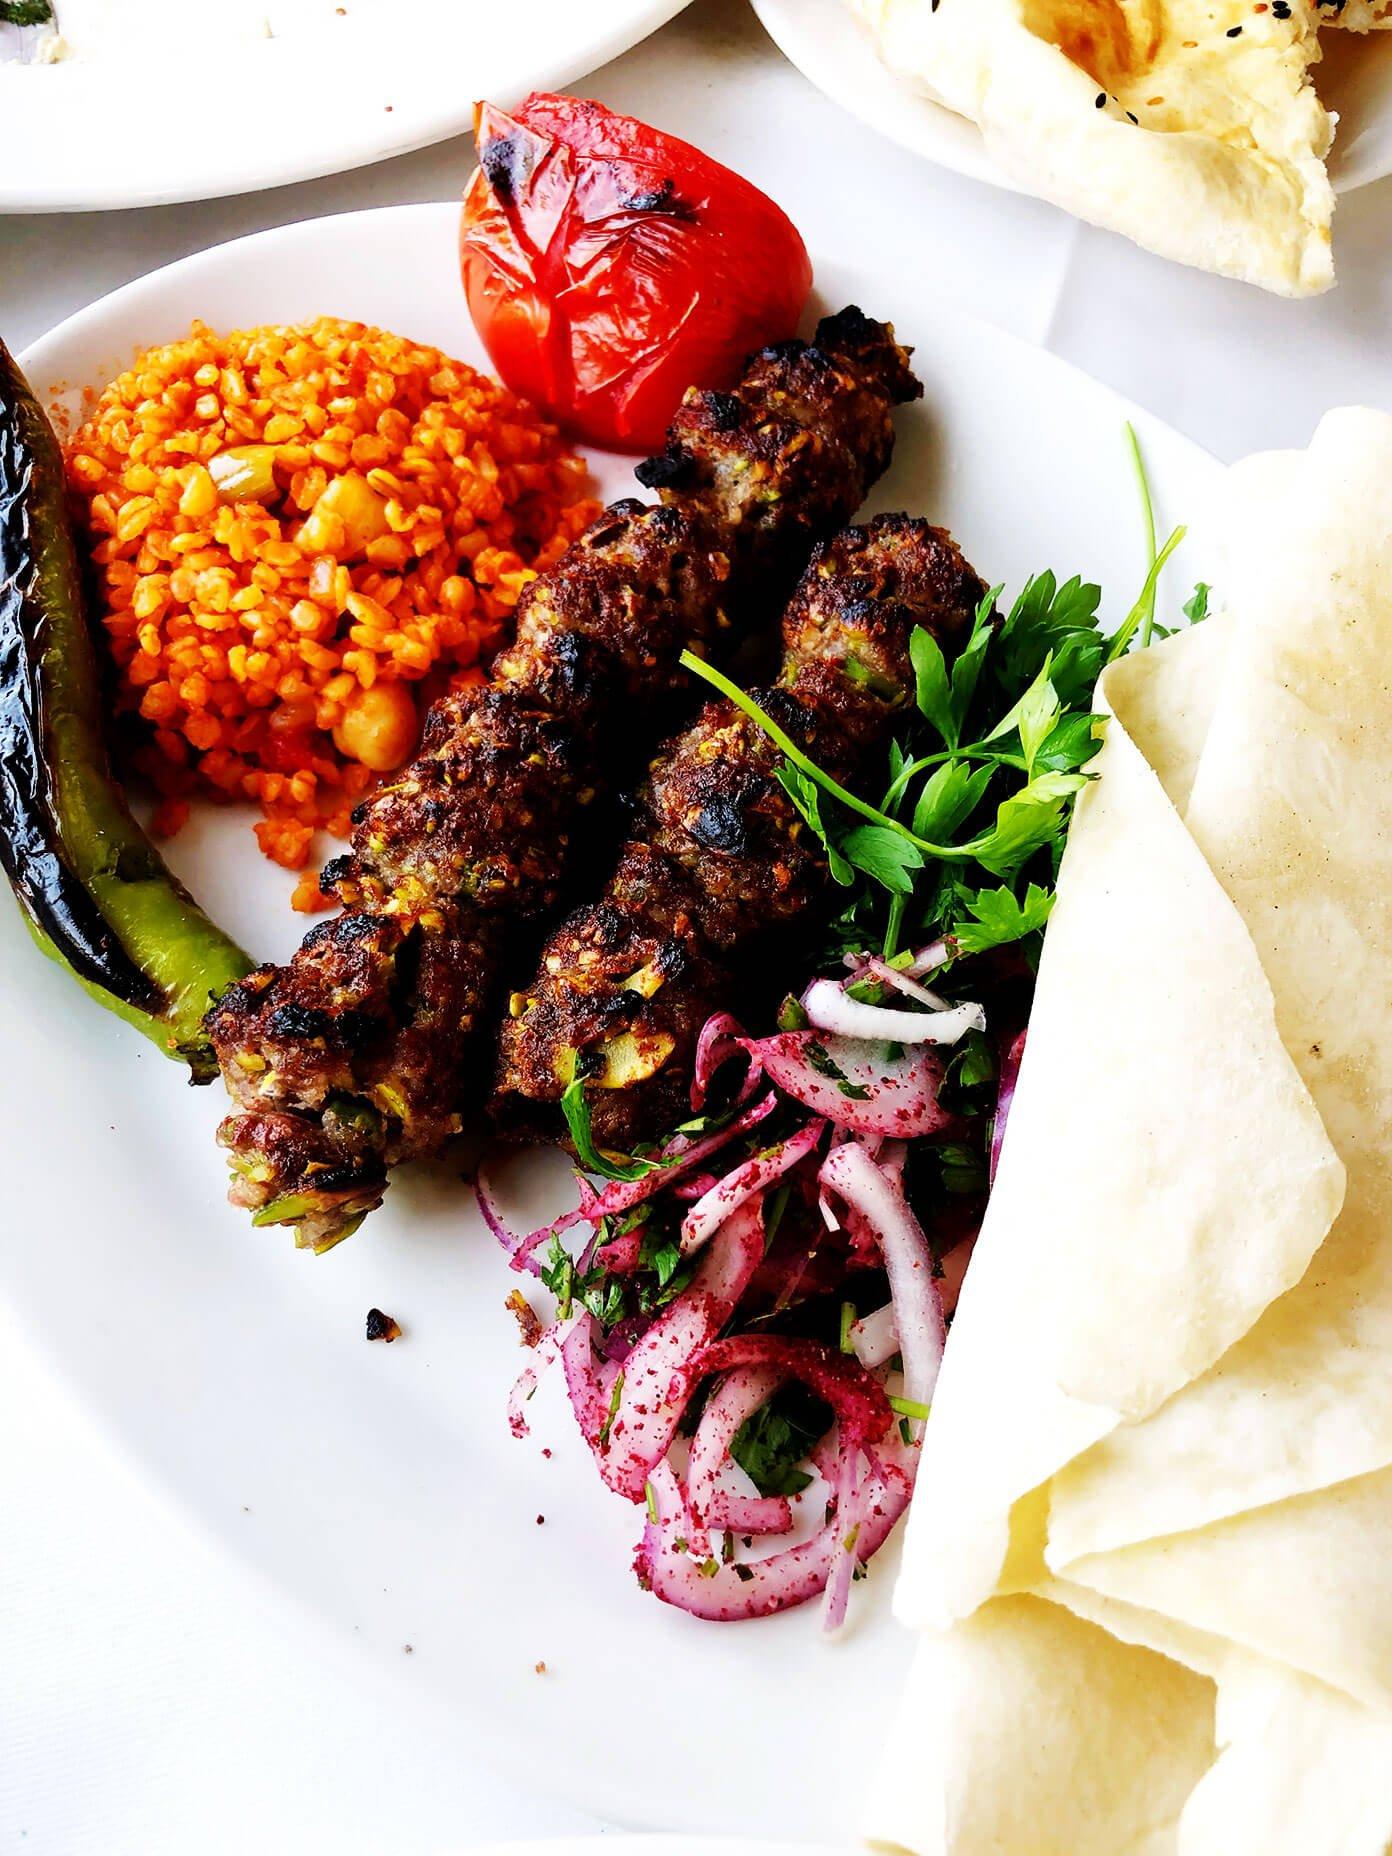 Pistachio kebab from Hamdi Restaurant Eminonu